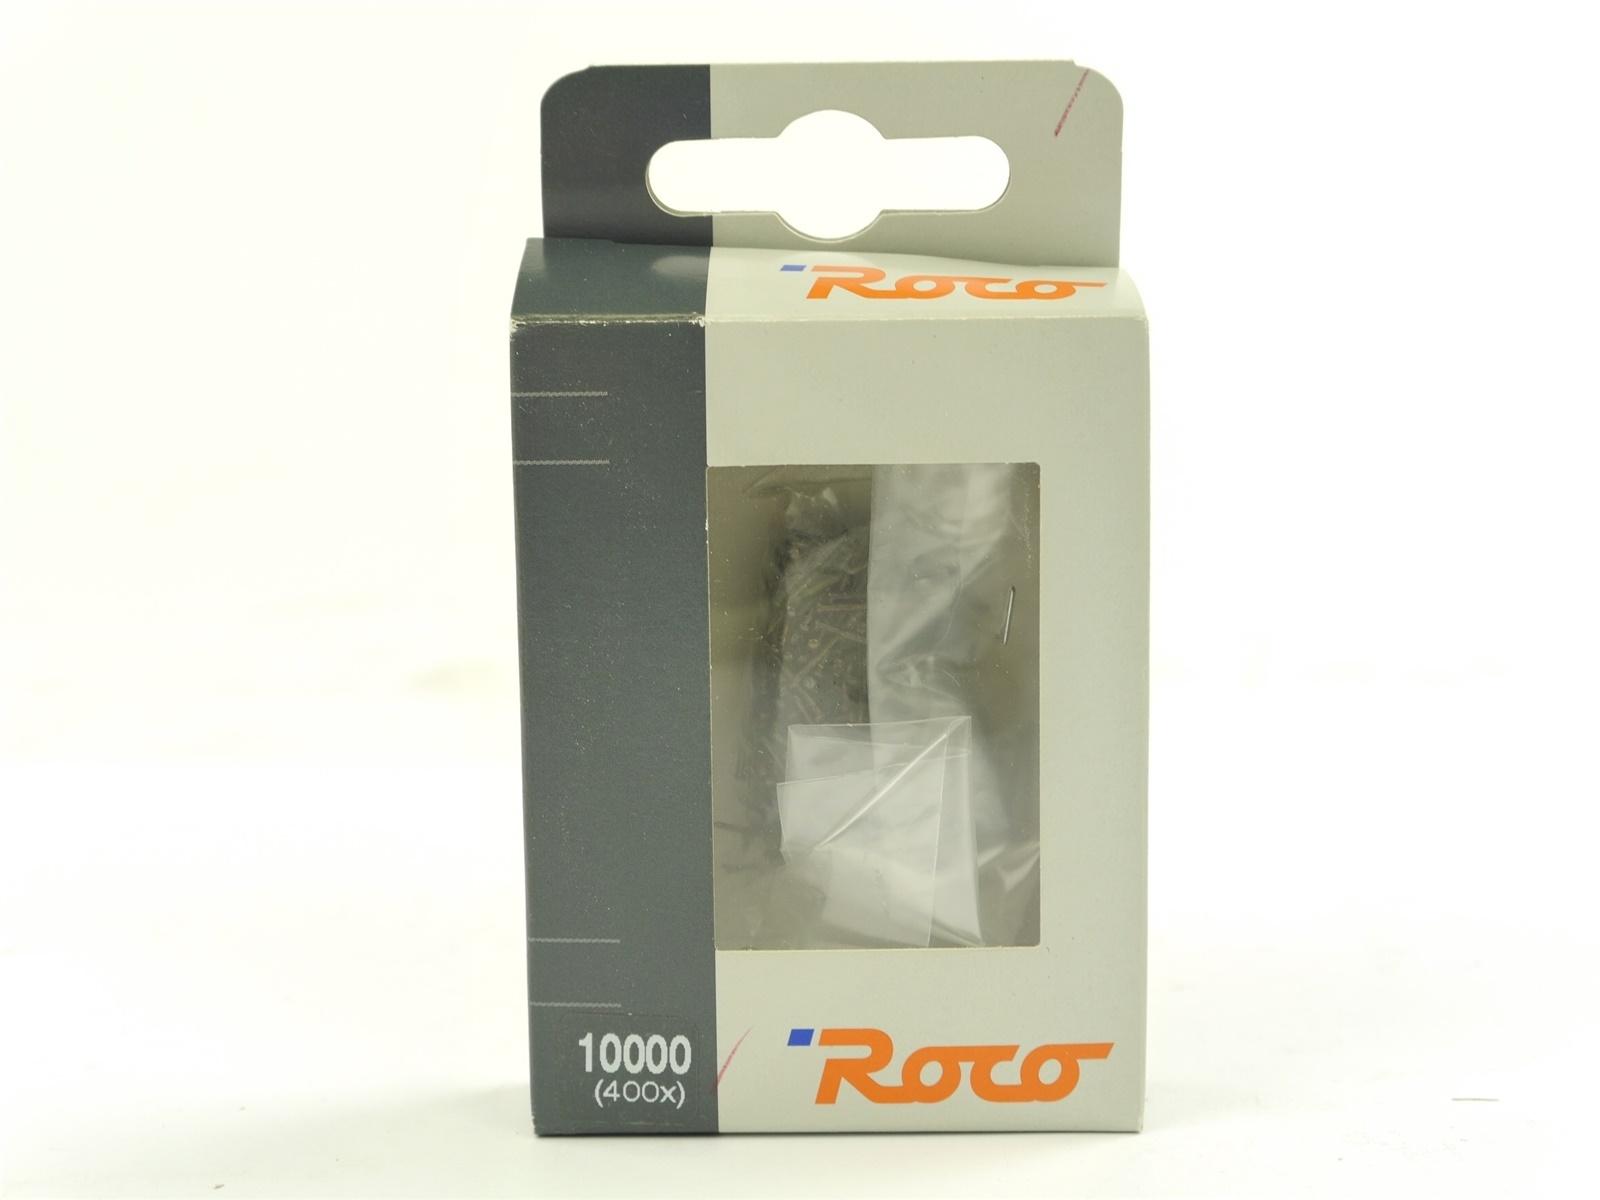 E135 Roco H0 10000 400x Gleisnägel *NEU*